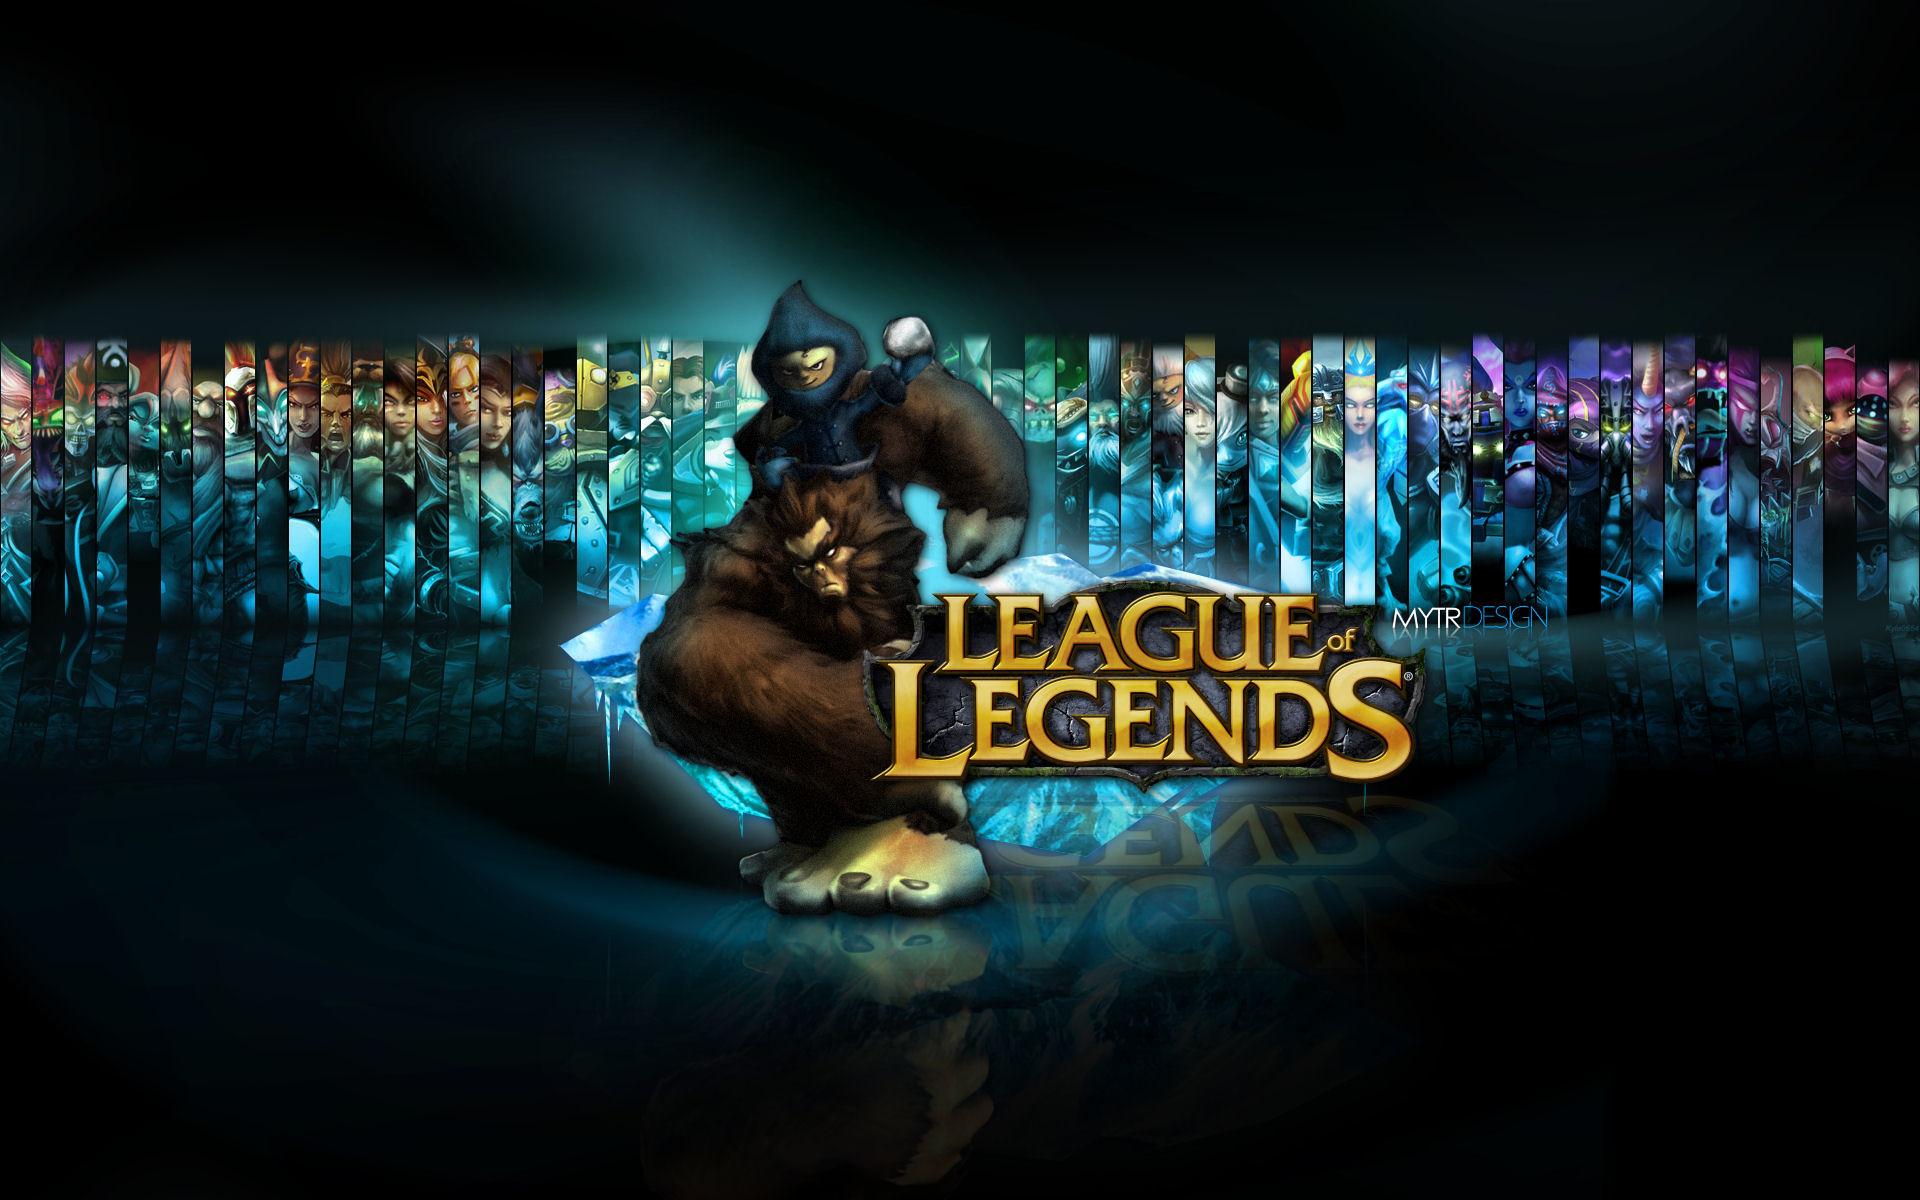 League of Legends LoL Wallpapers Best Wallpapers 1920×1080 Lol Wallpapers  (37 Wallpapers)